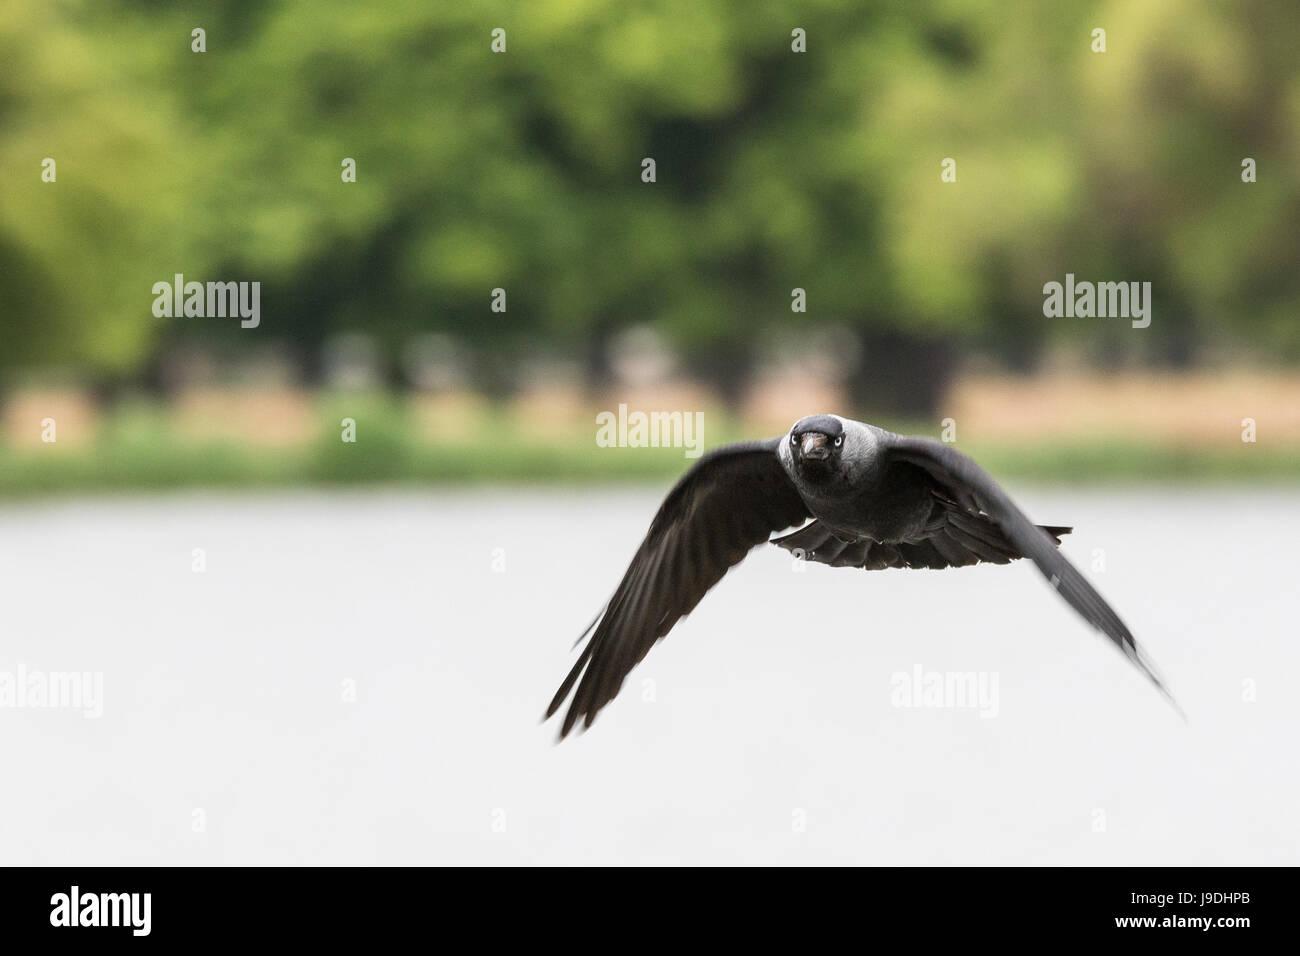 Jackdaw in flight - Stock Image